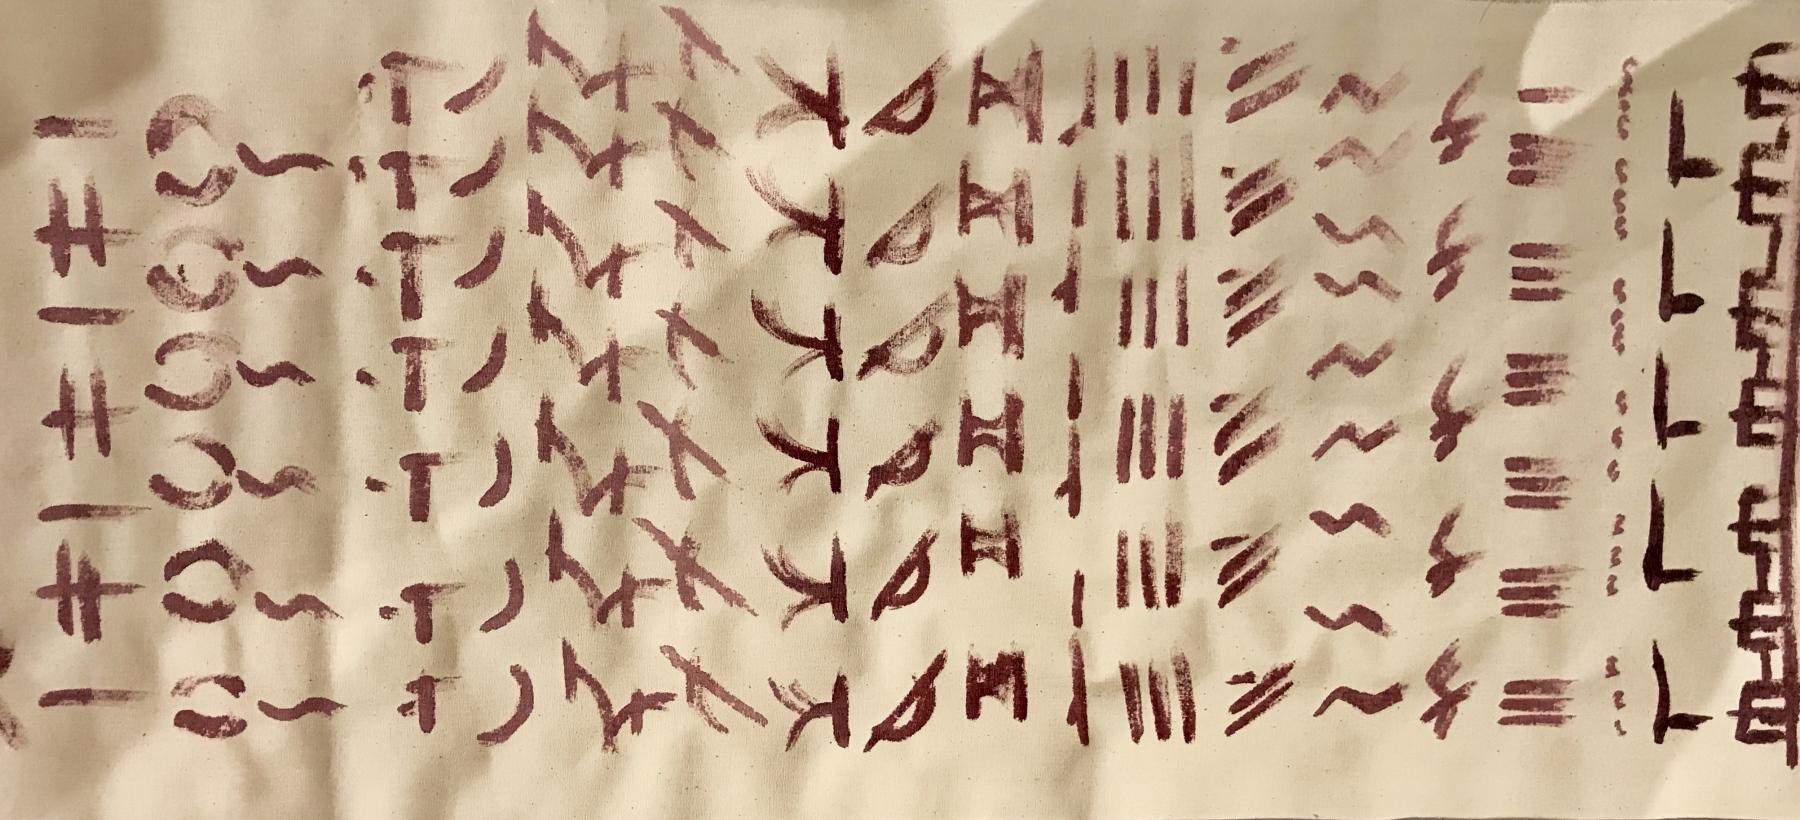 "<em>Feuei Tola, opera ispirata allo haiku ""Camminando rompo rami secchi"", 2020</em>"